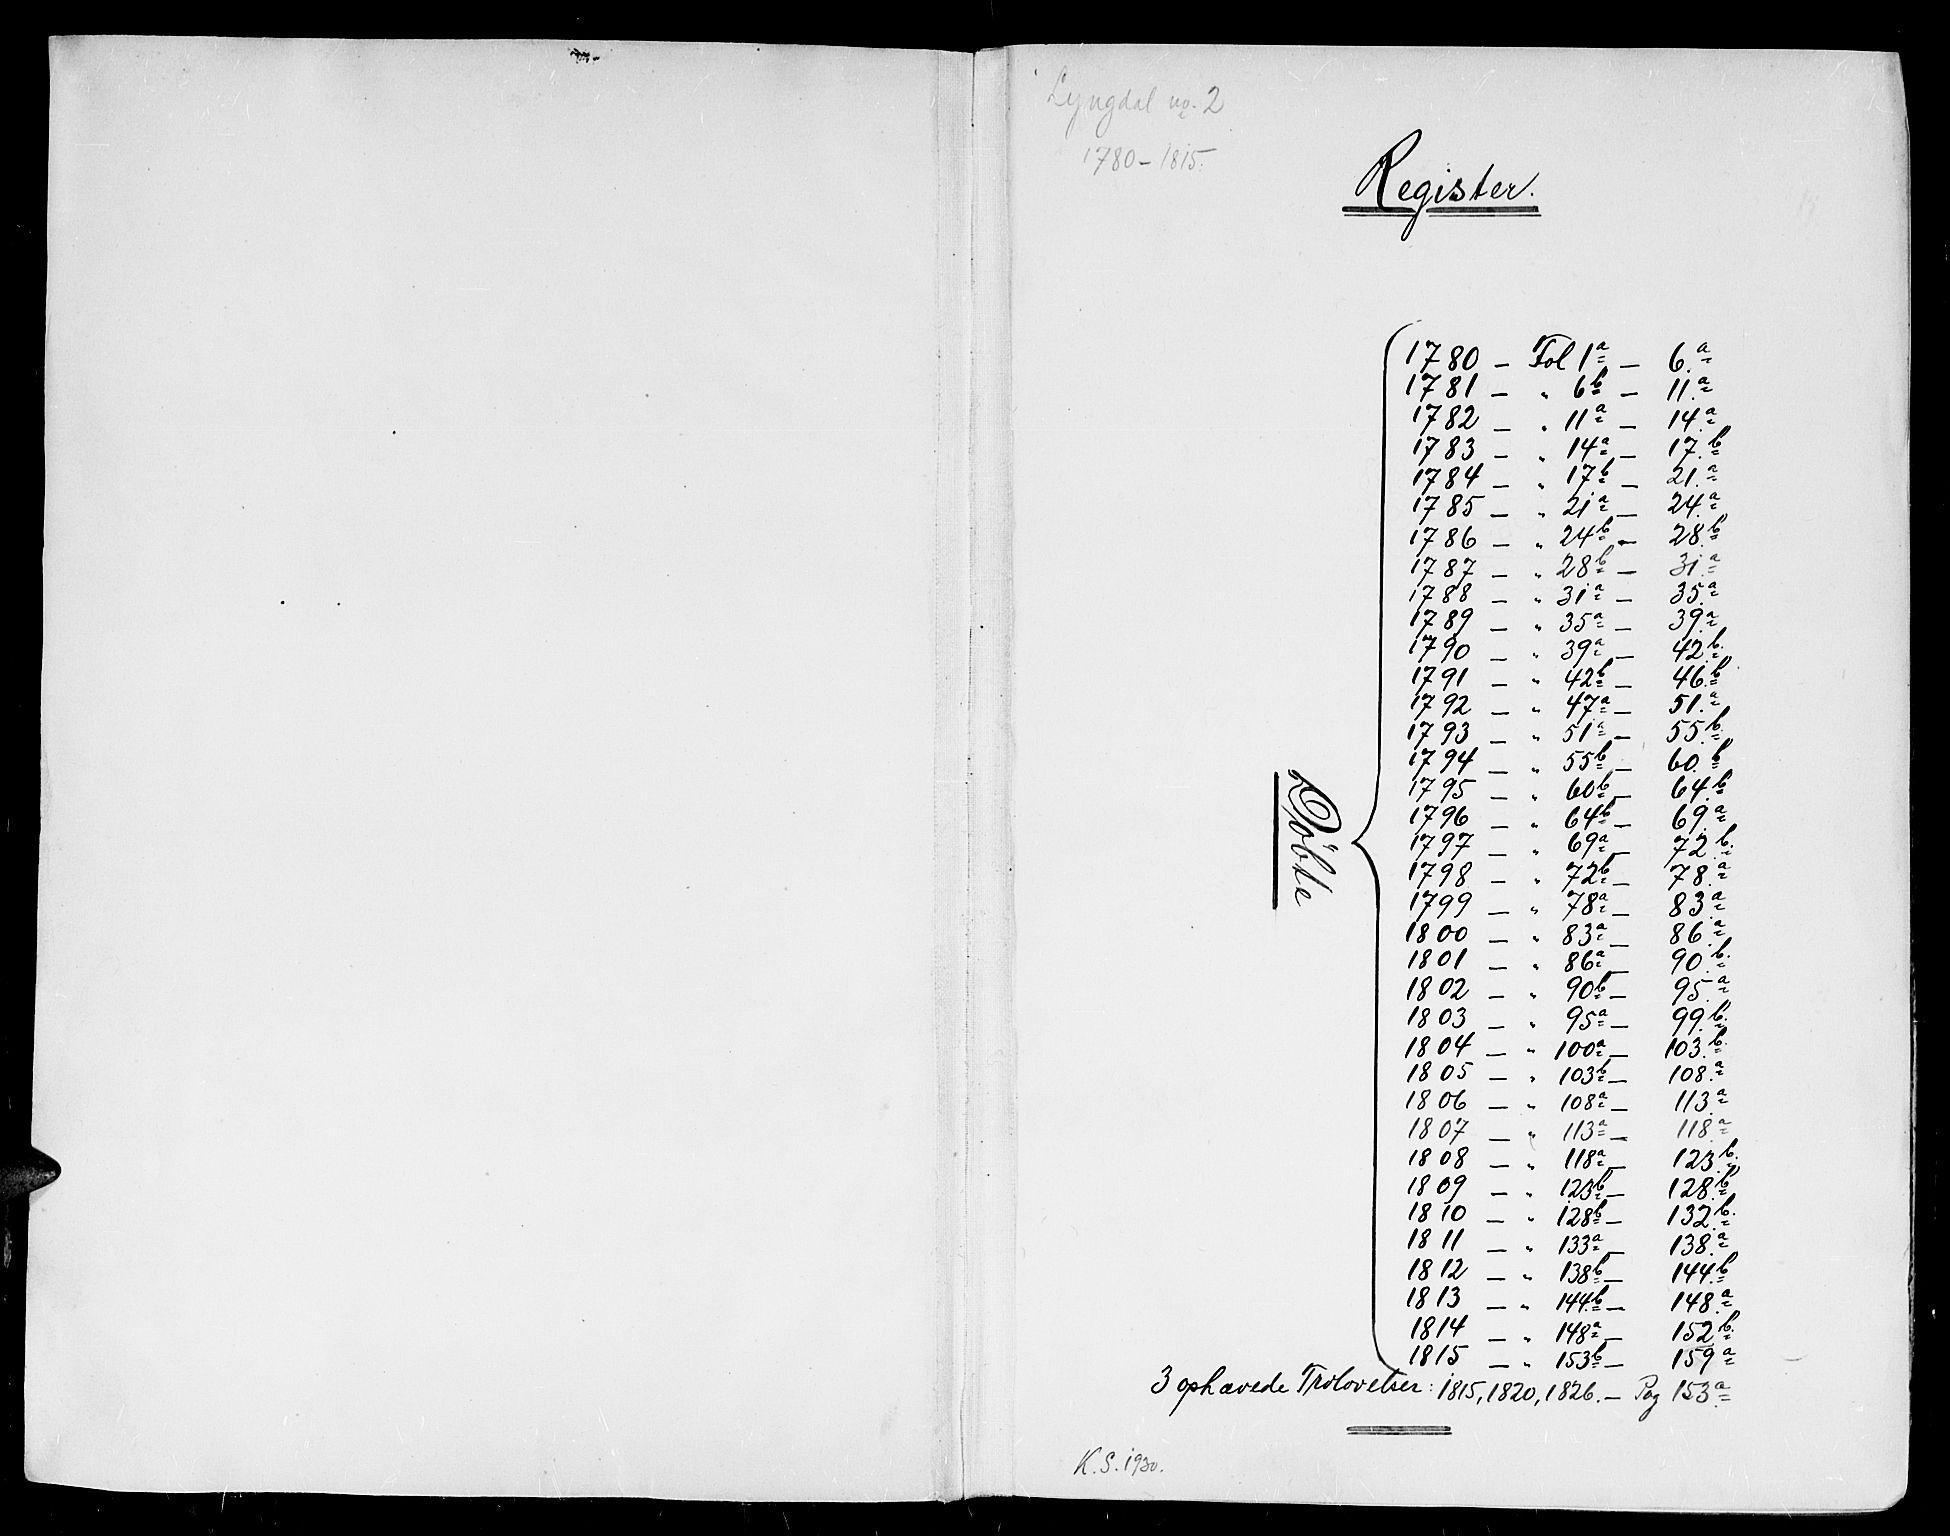 SAK, Lyngdal sokneprestkontor, F/Fa/Fac/L0004: Ministerialbok nr. A 4, 1780-1815